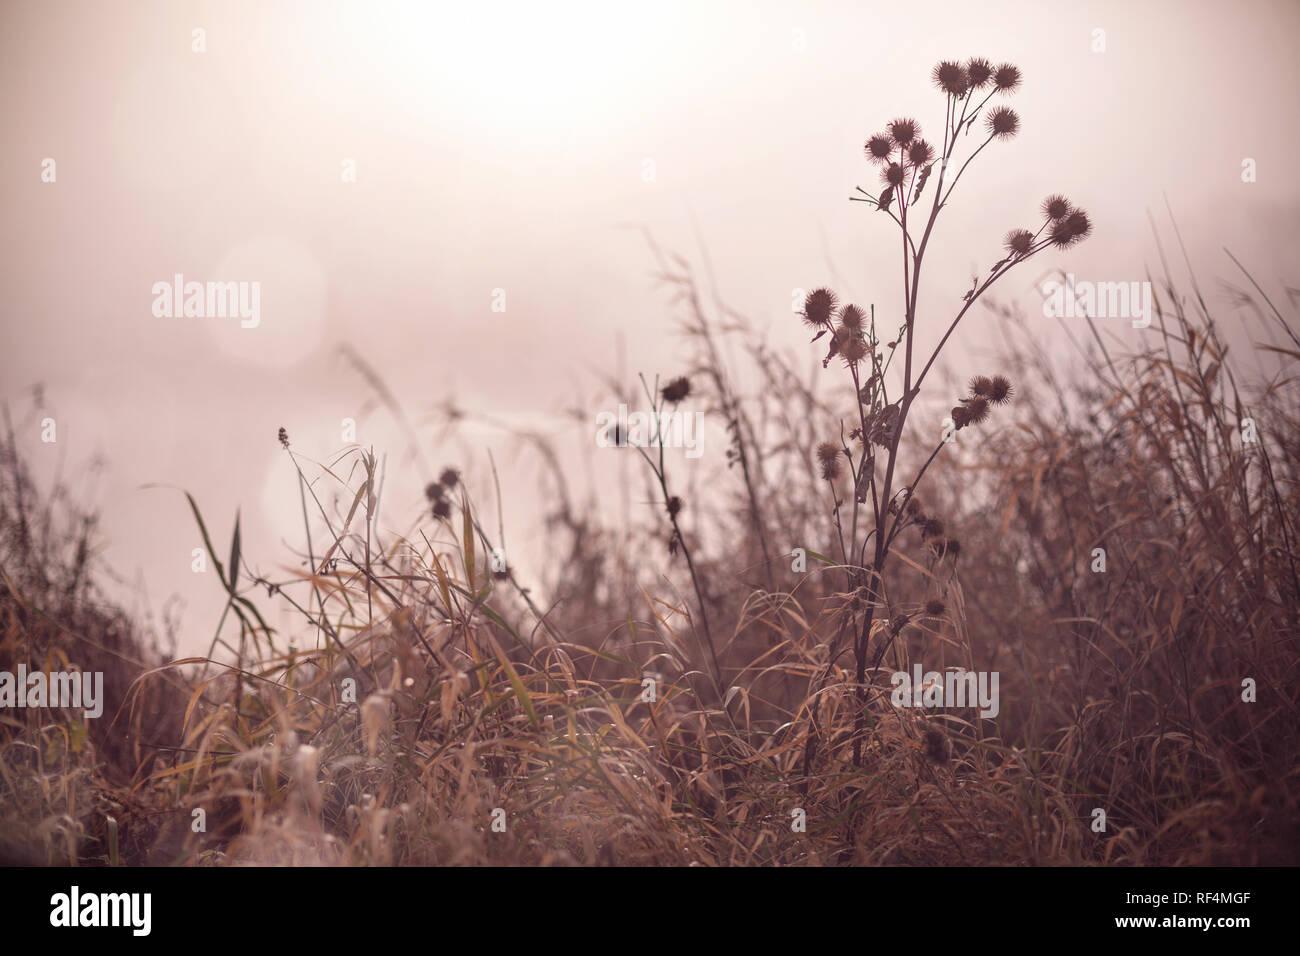 Plants next to the shore of a foggy lake at sunrise - melancholic atmosphere - Stock Image